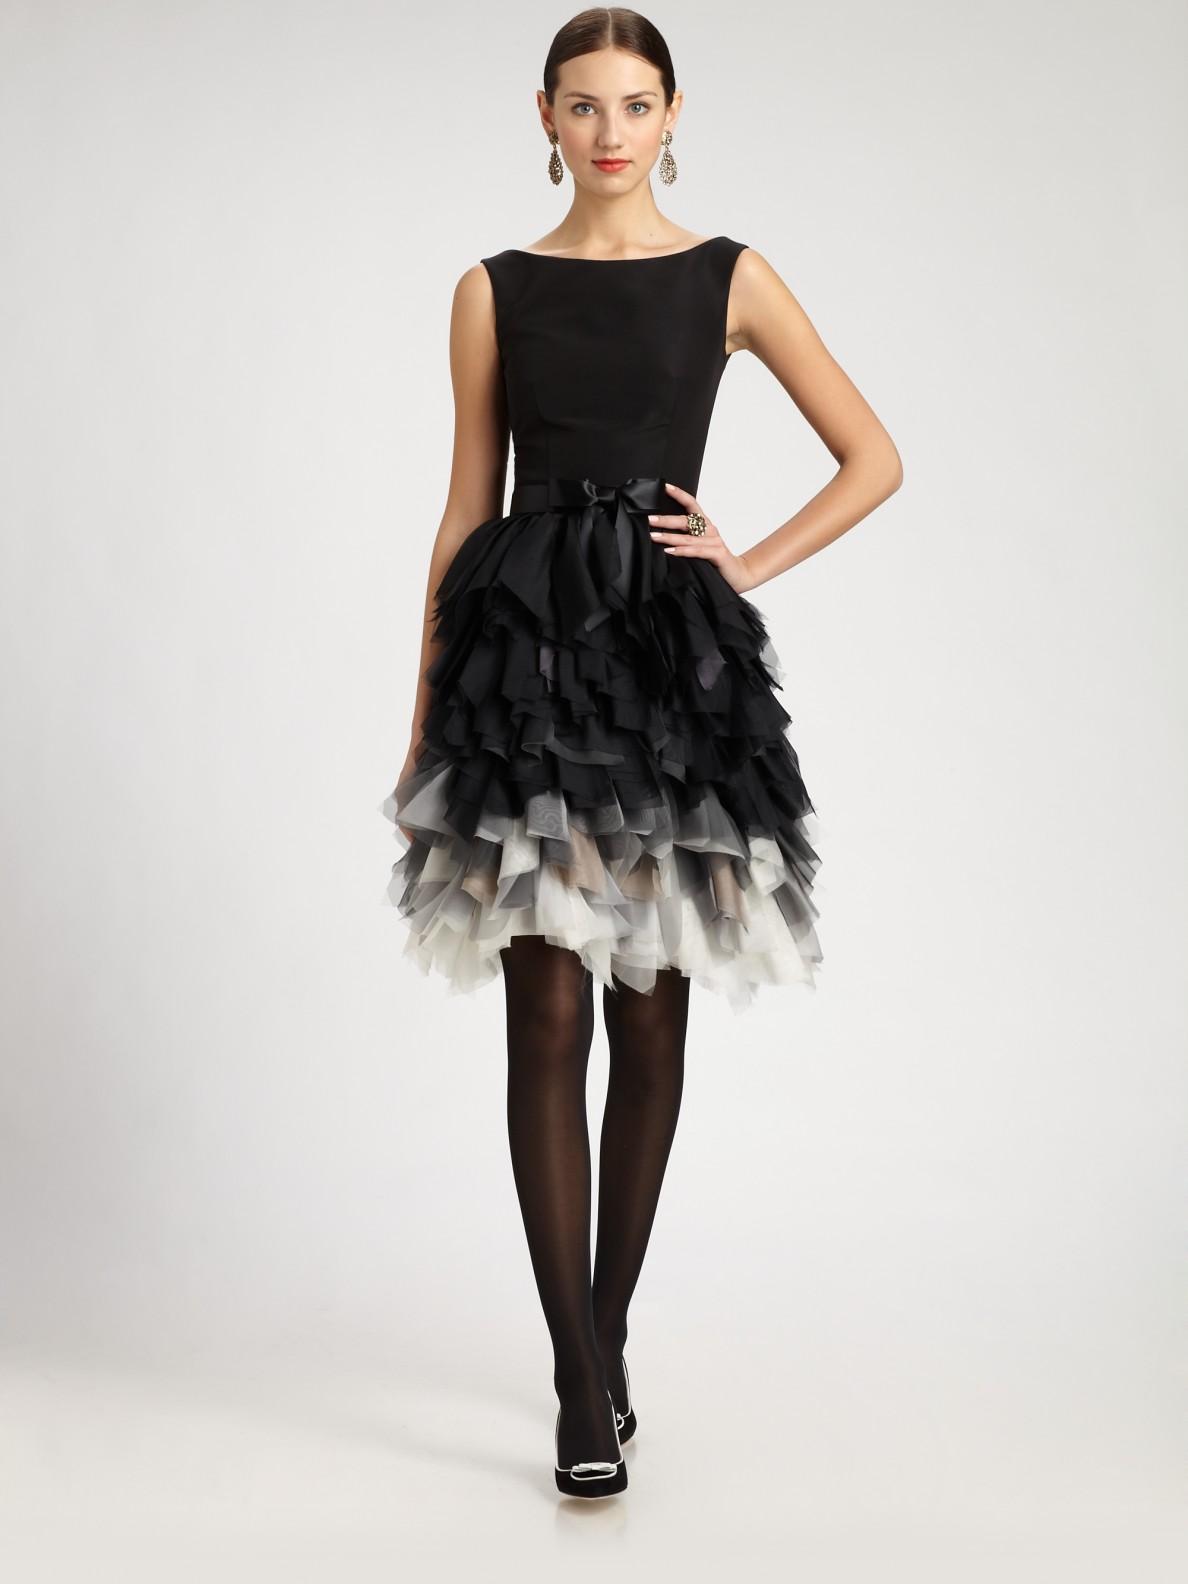 Oscar de la renta Silk Feathered Skirt Dress in Black